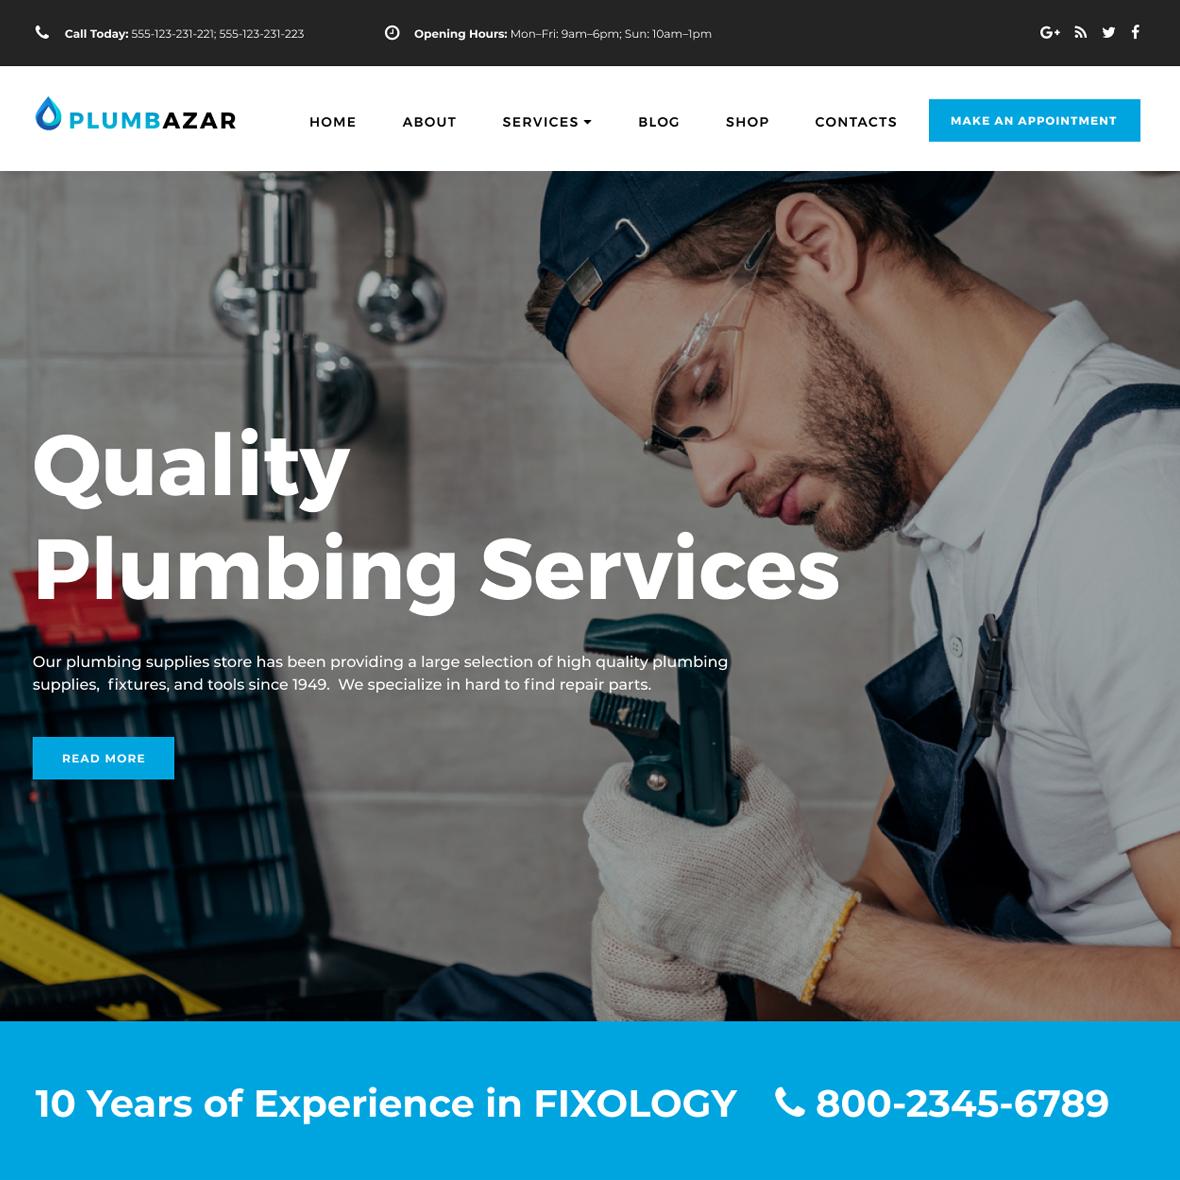 Plumbazar | Plumber Service WordPress Site